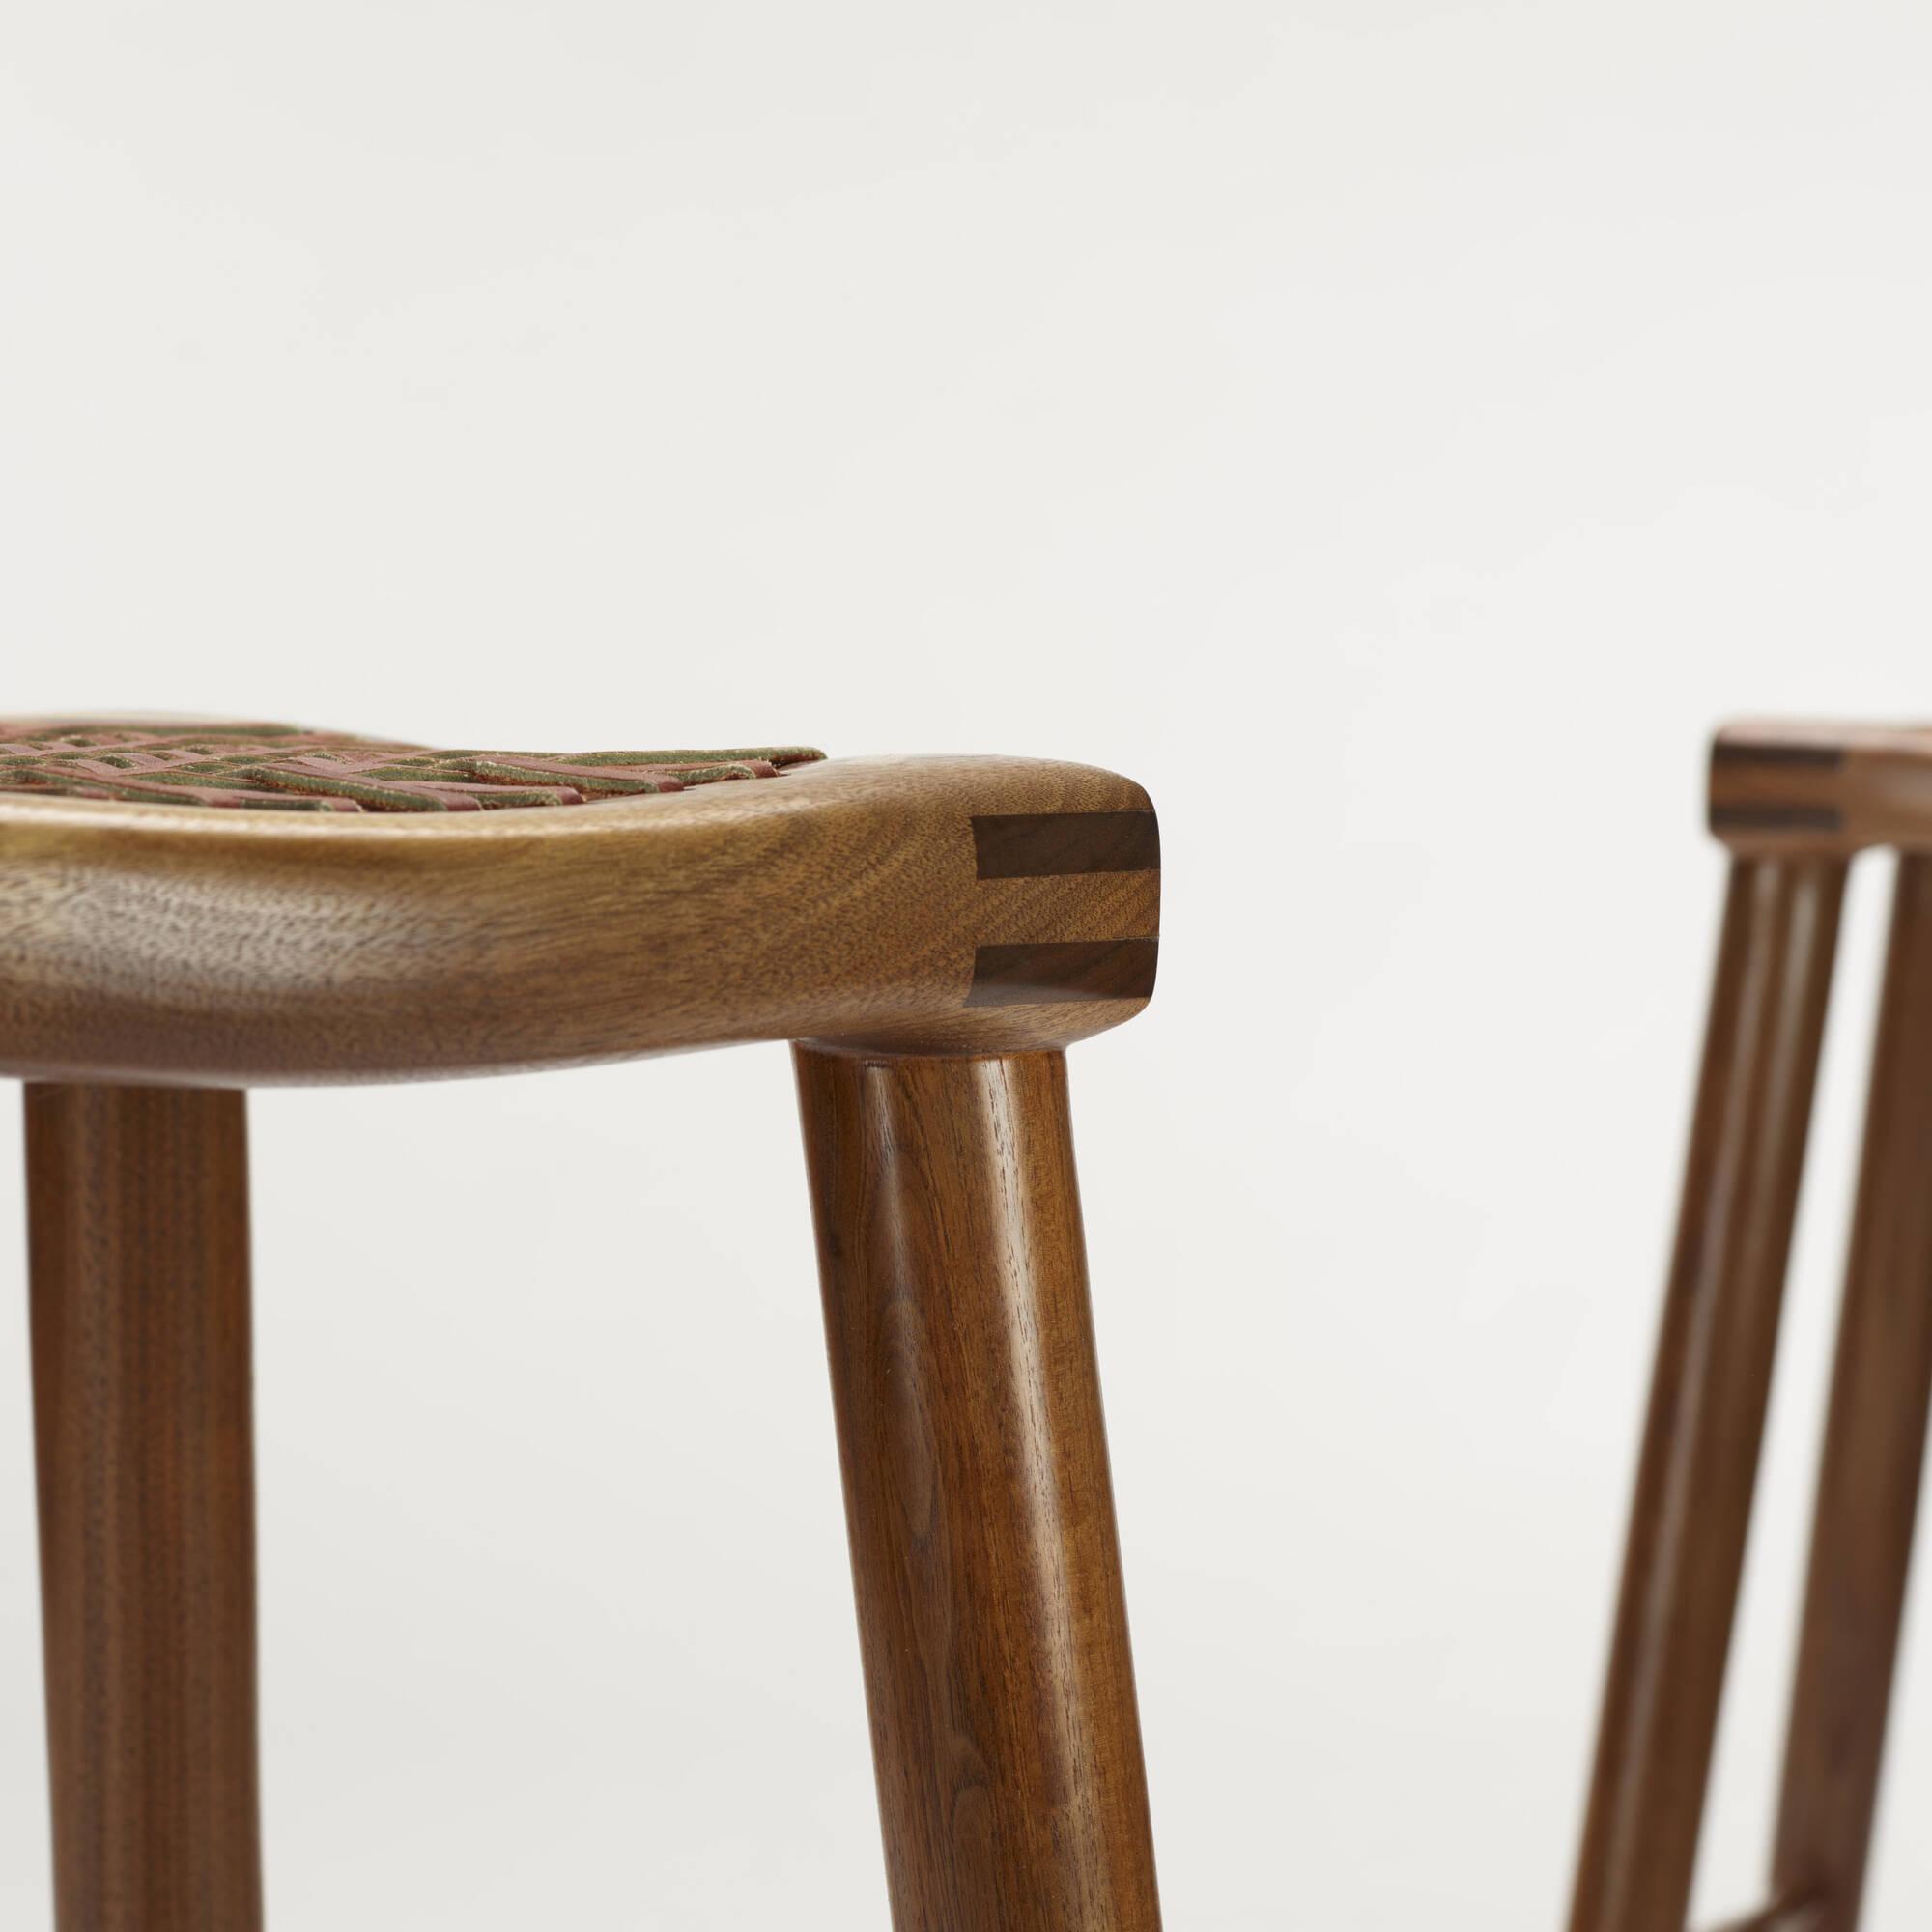 179: Sam Maloof / bar stools, set of three (4 of 4)